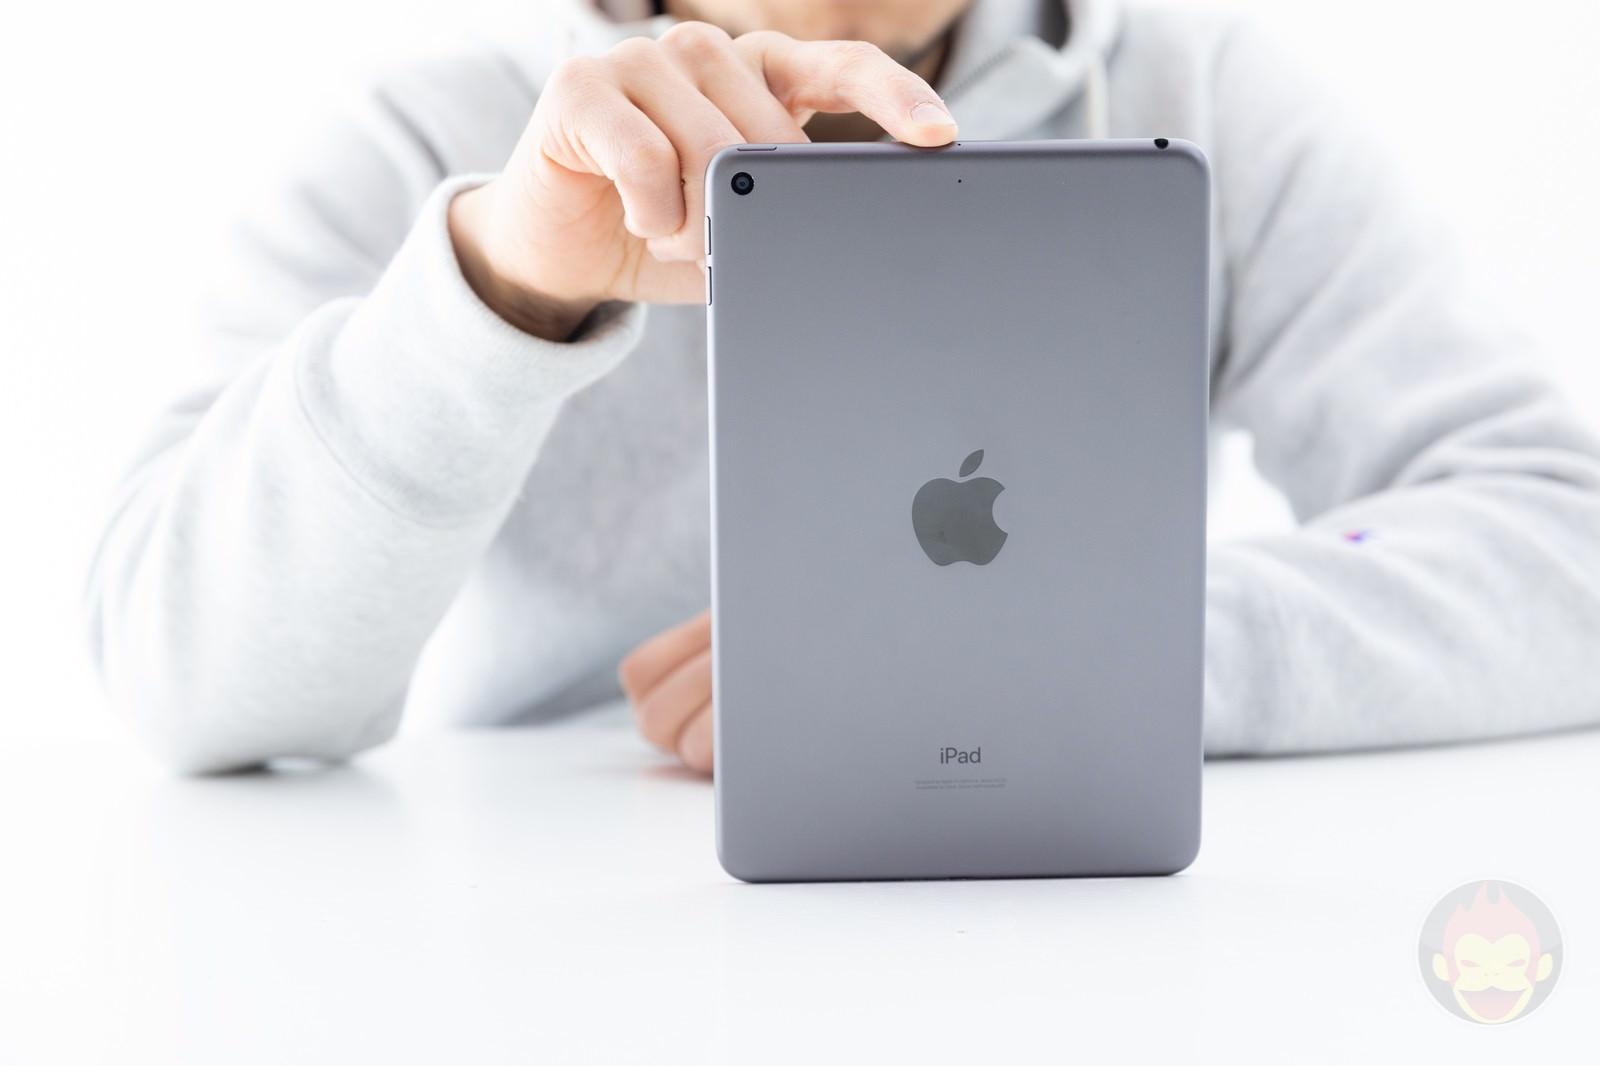 Ipad mini and ipad new models 02